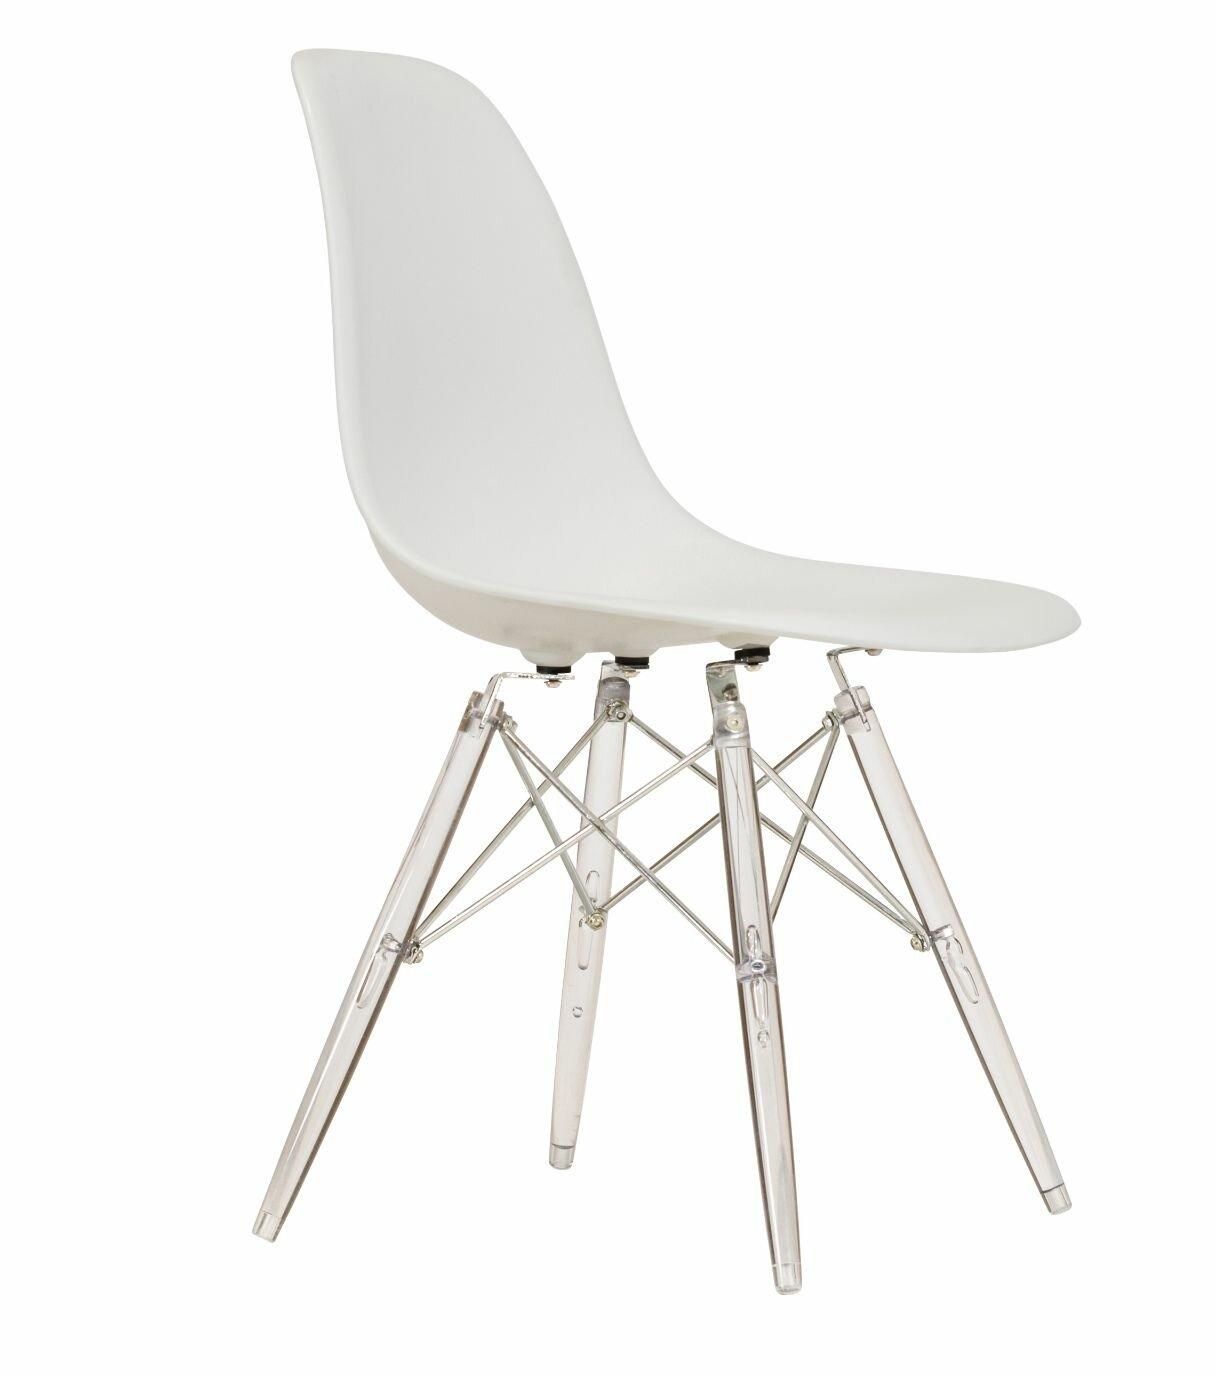 Tremendous Finkel Mid Century Modern Dining Chair Creativecarmelina Interior Chair Design Creativecarmelinacom